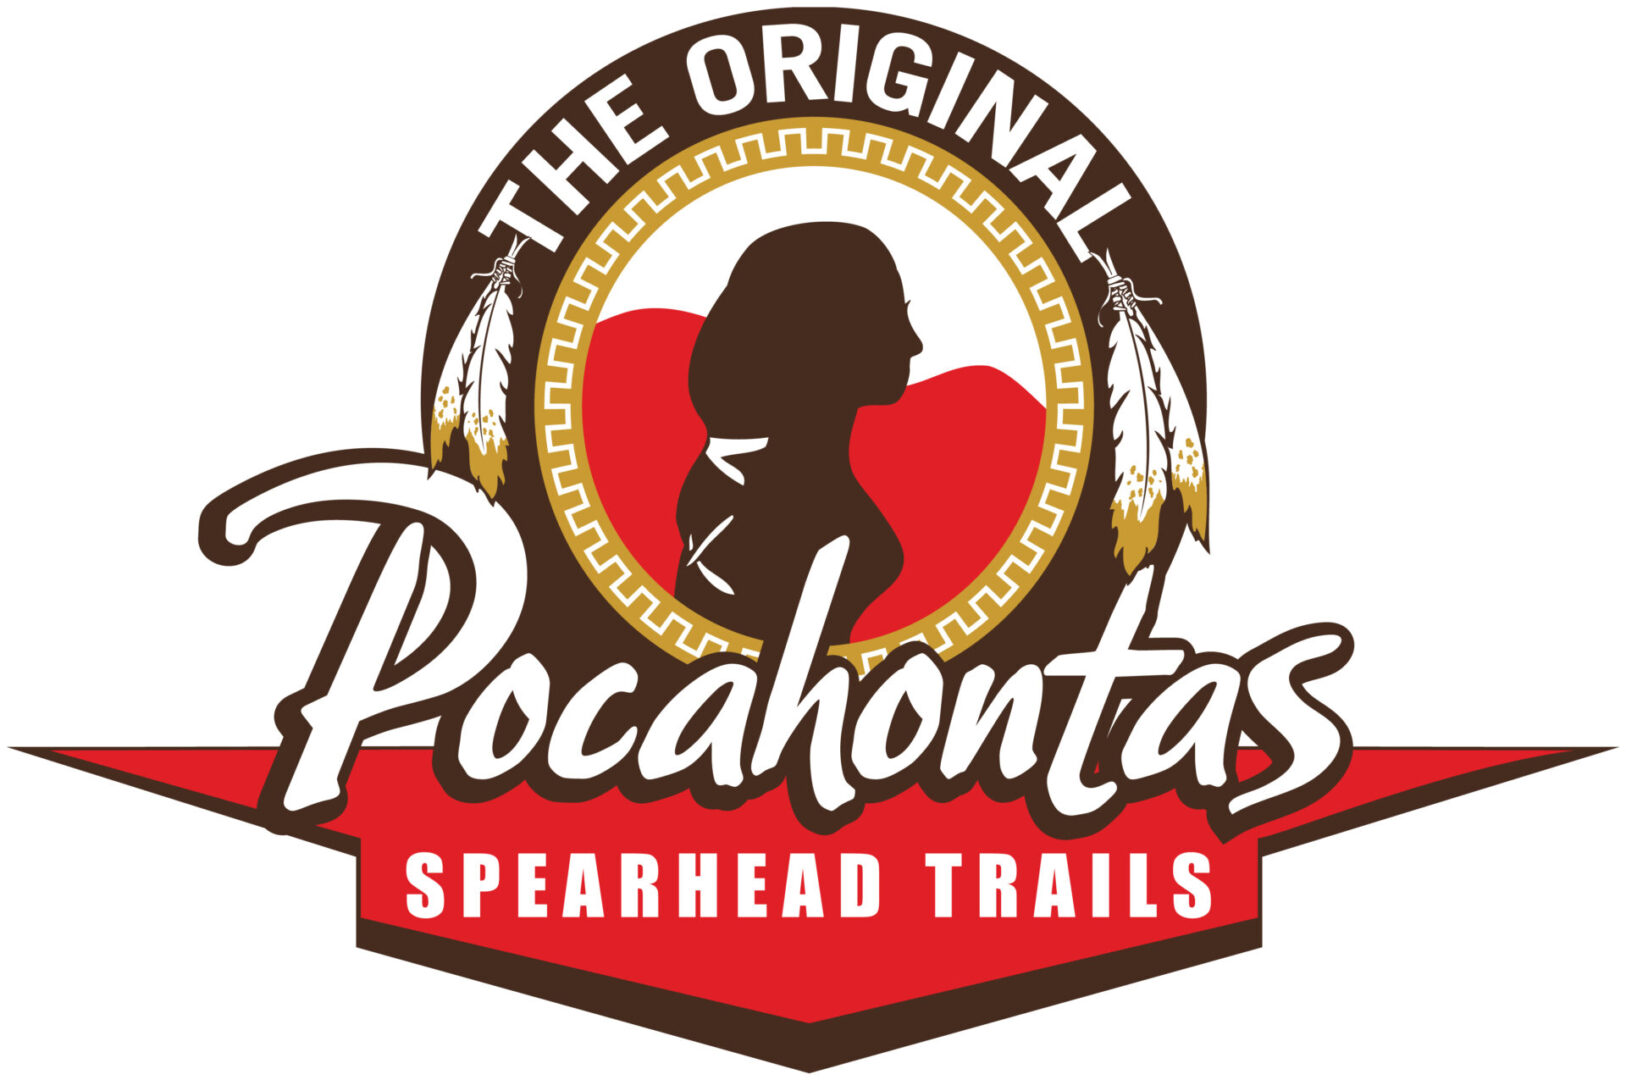 https://spearheadtrails.com/wp-content/uploads/2020/05/pocahontas-scaled.jpg